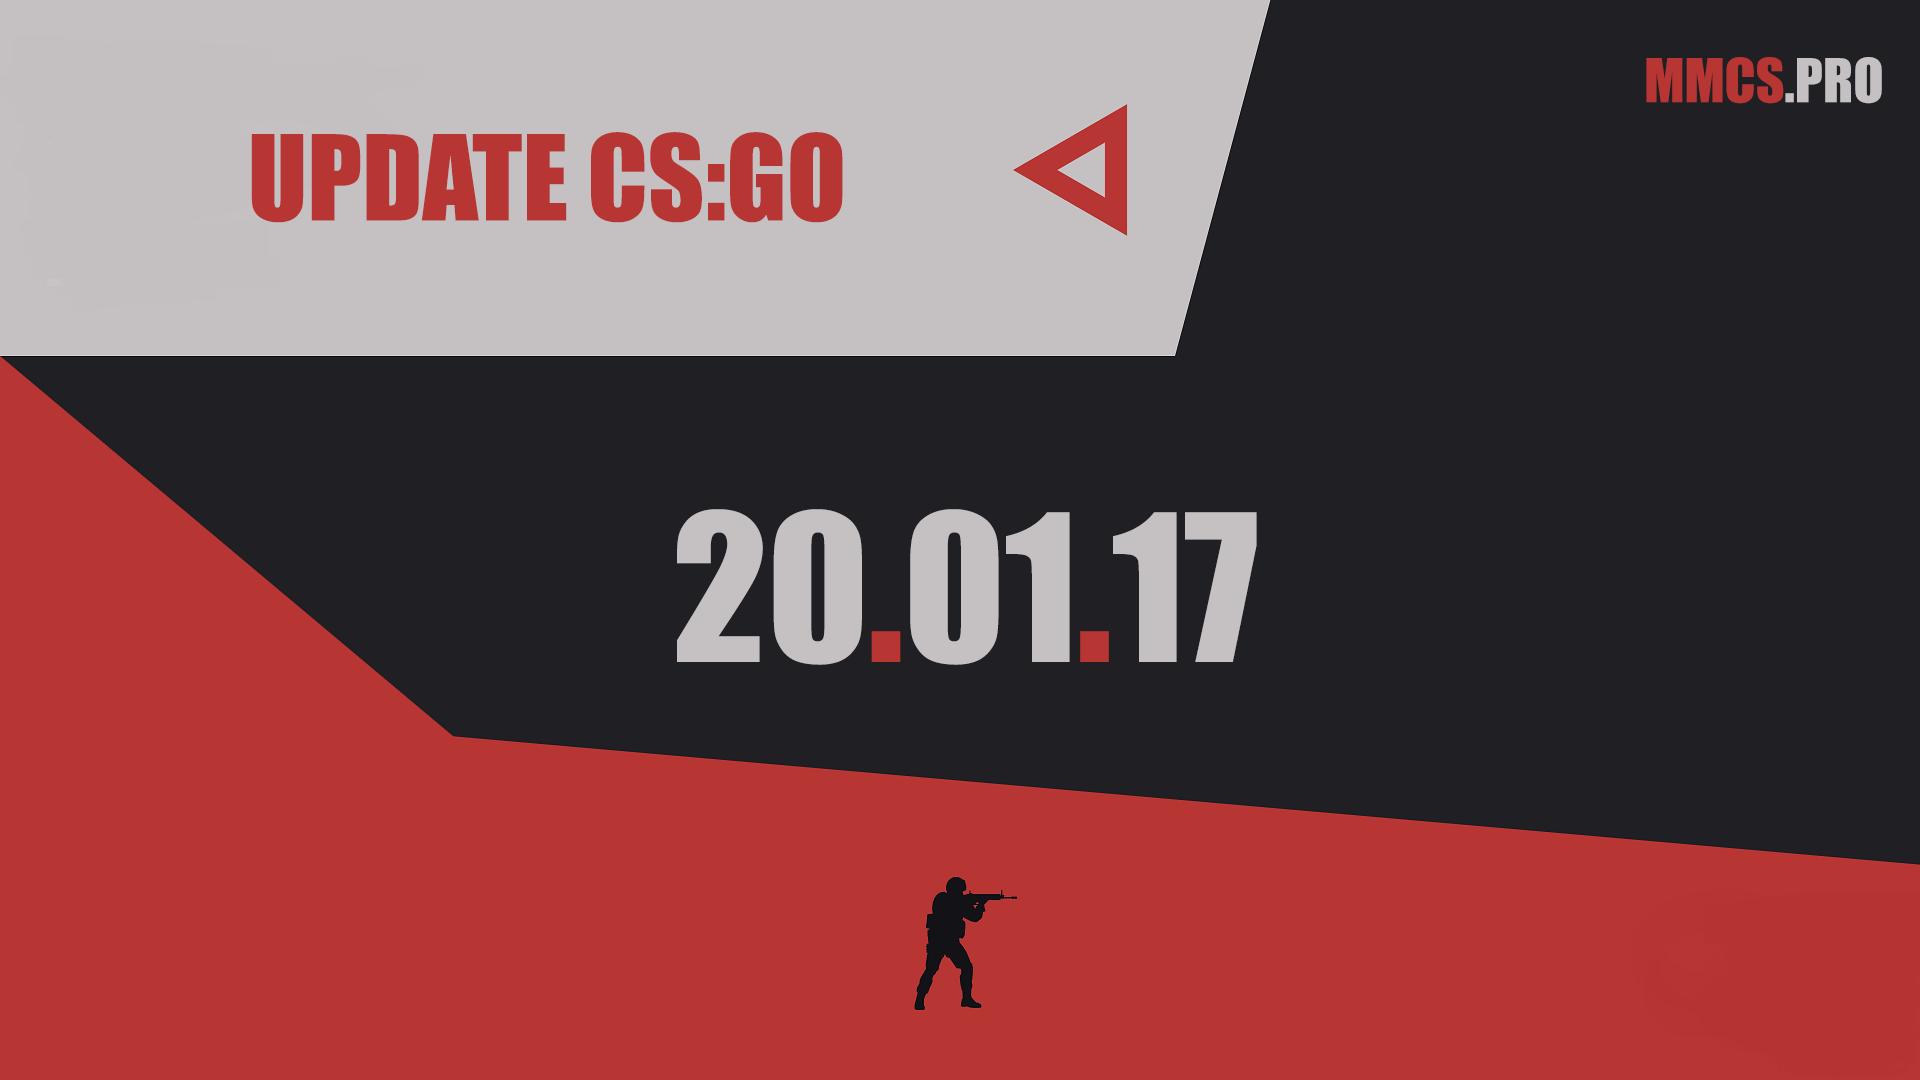 https://mmcs.pro/update-csgo-20-01-2017-valve/